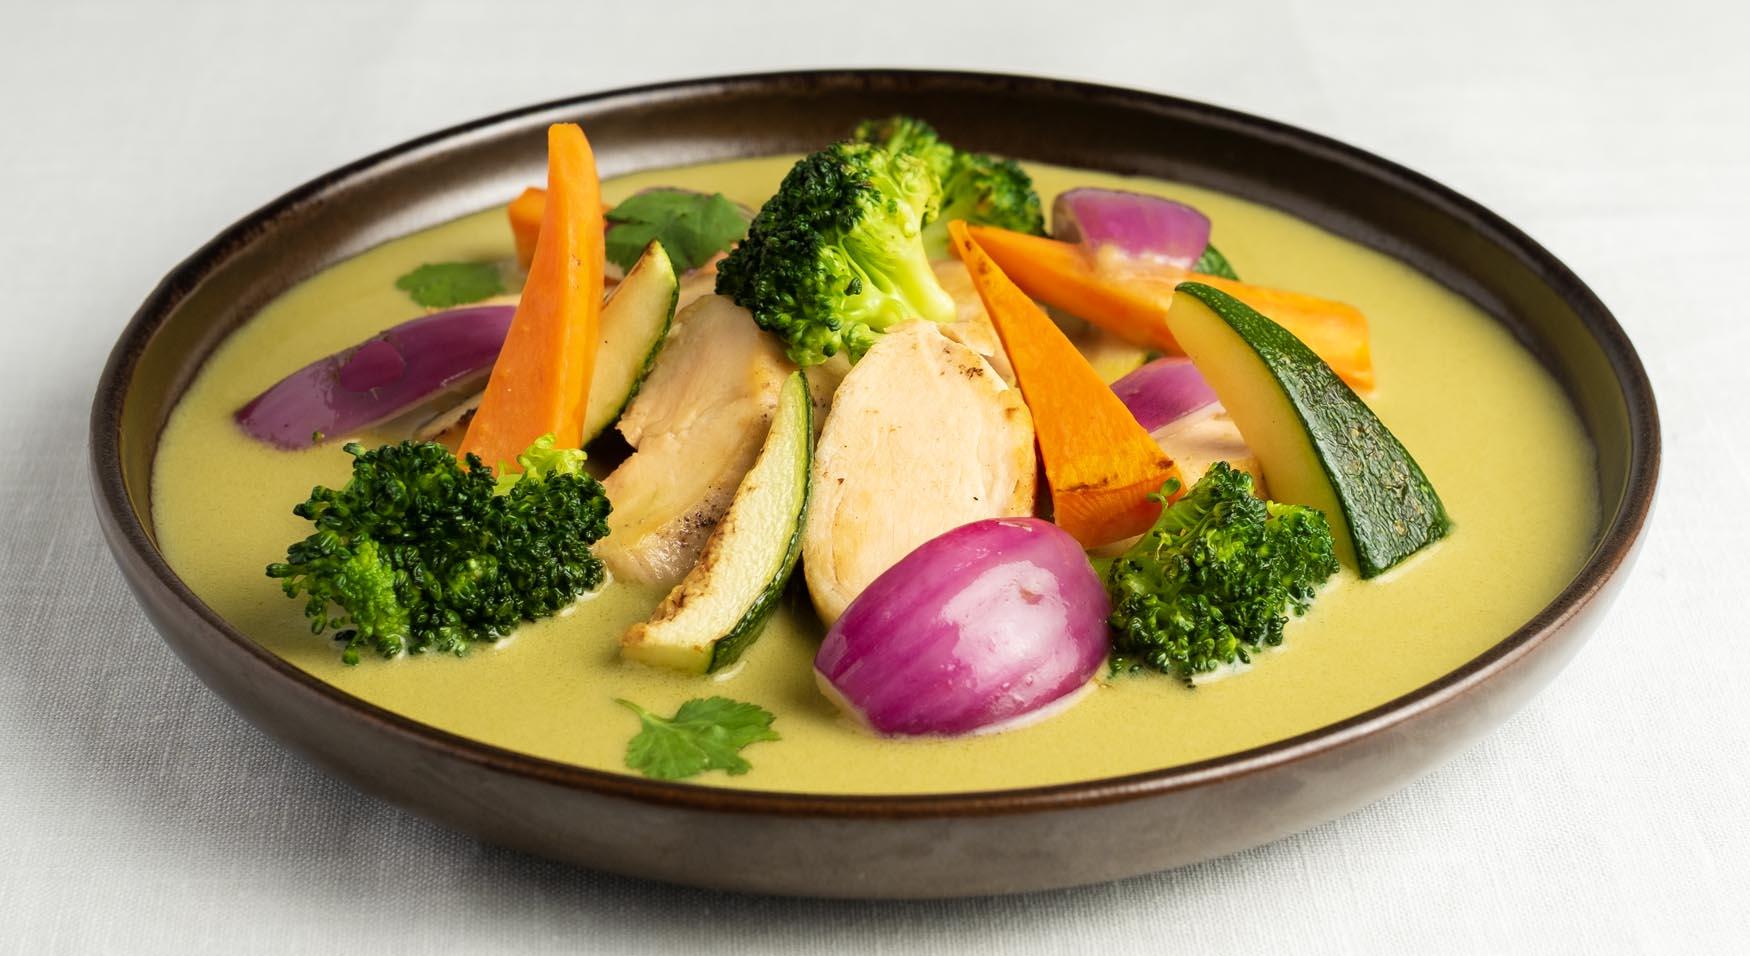 Pollo al curry verde tailandés respetando la receta tradicional, acompañado de verduras de temporada